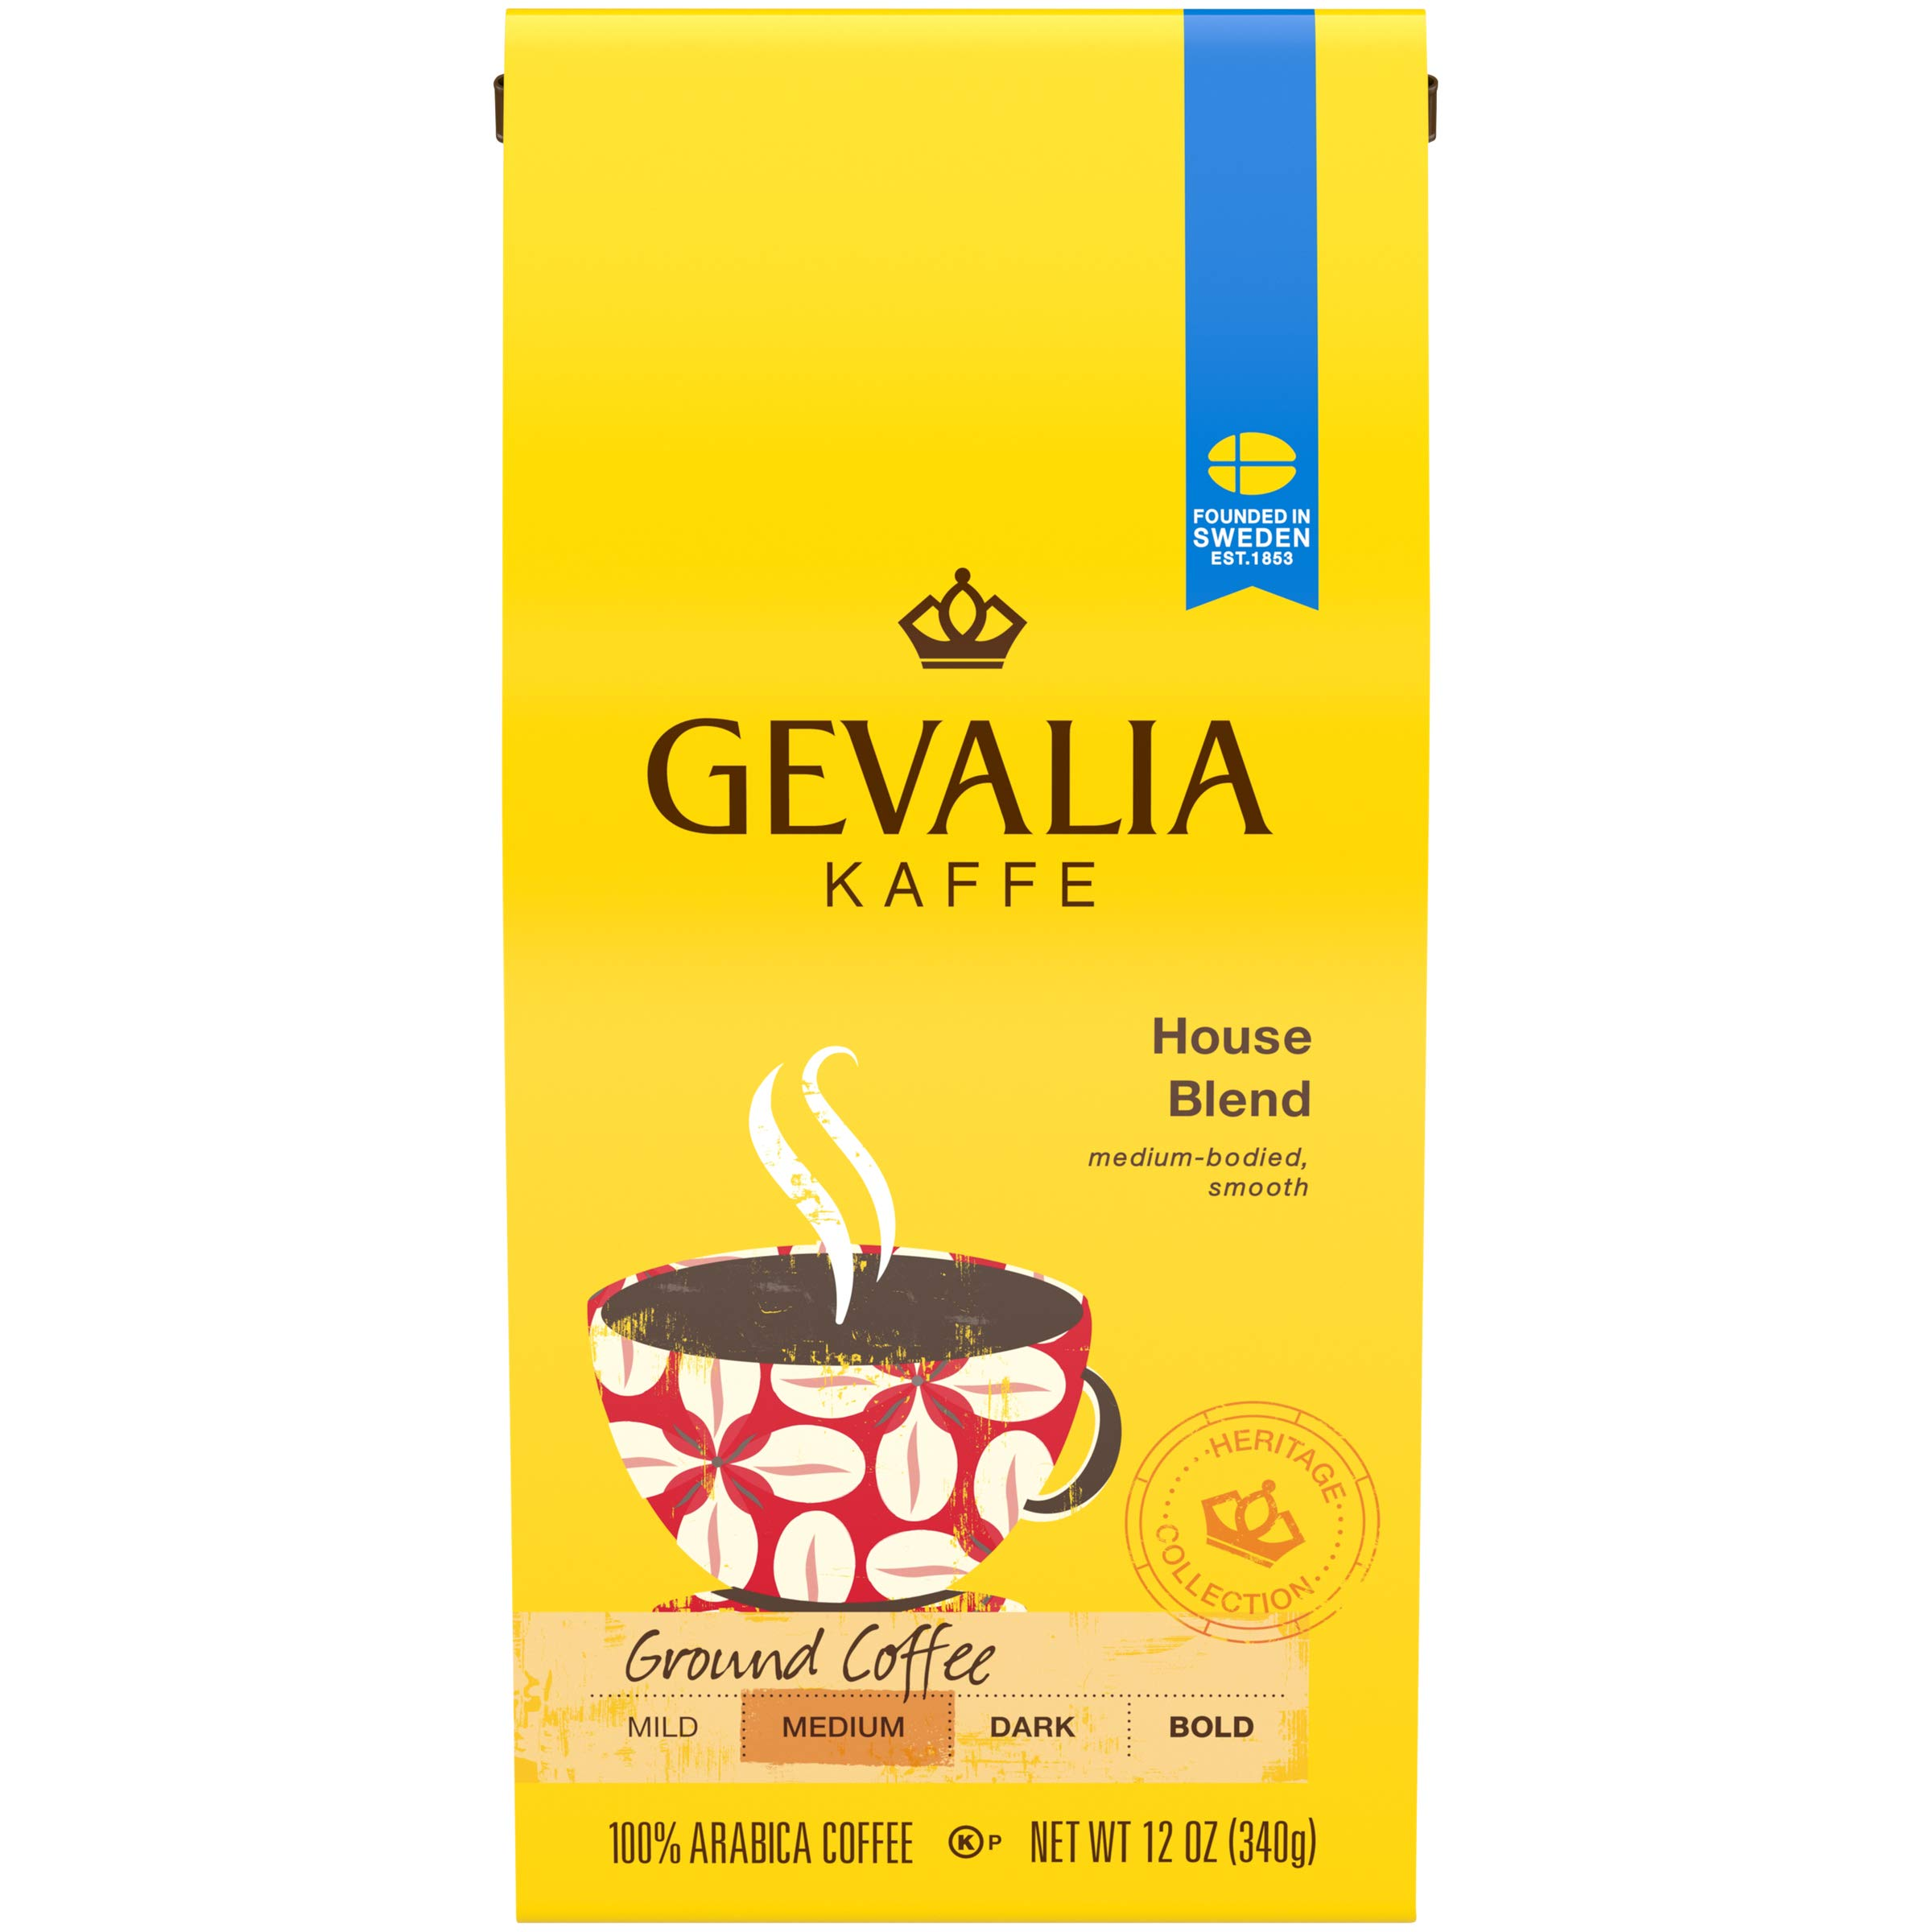 Gevalia House Blend Ground Coffee, 12 Oz, Pack of 6